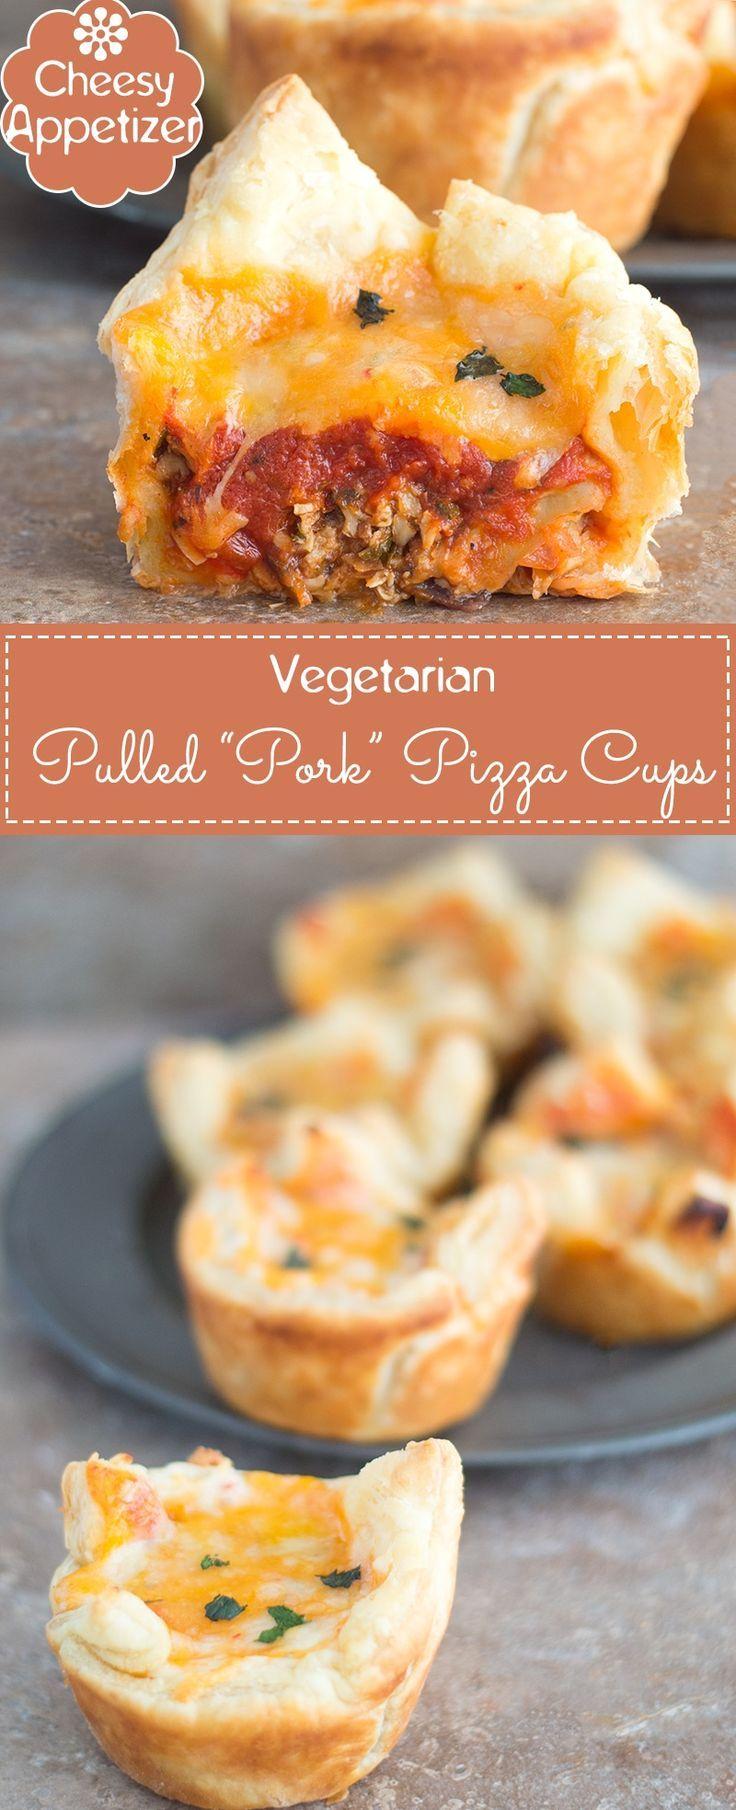 Veggie Pulled Pork Pizza Cups Recipe Food recipes